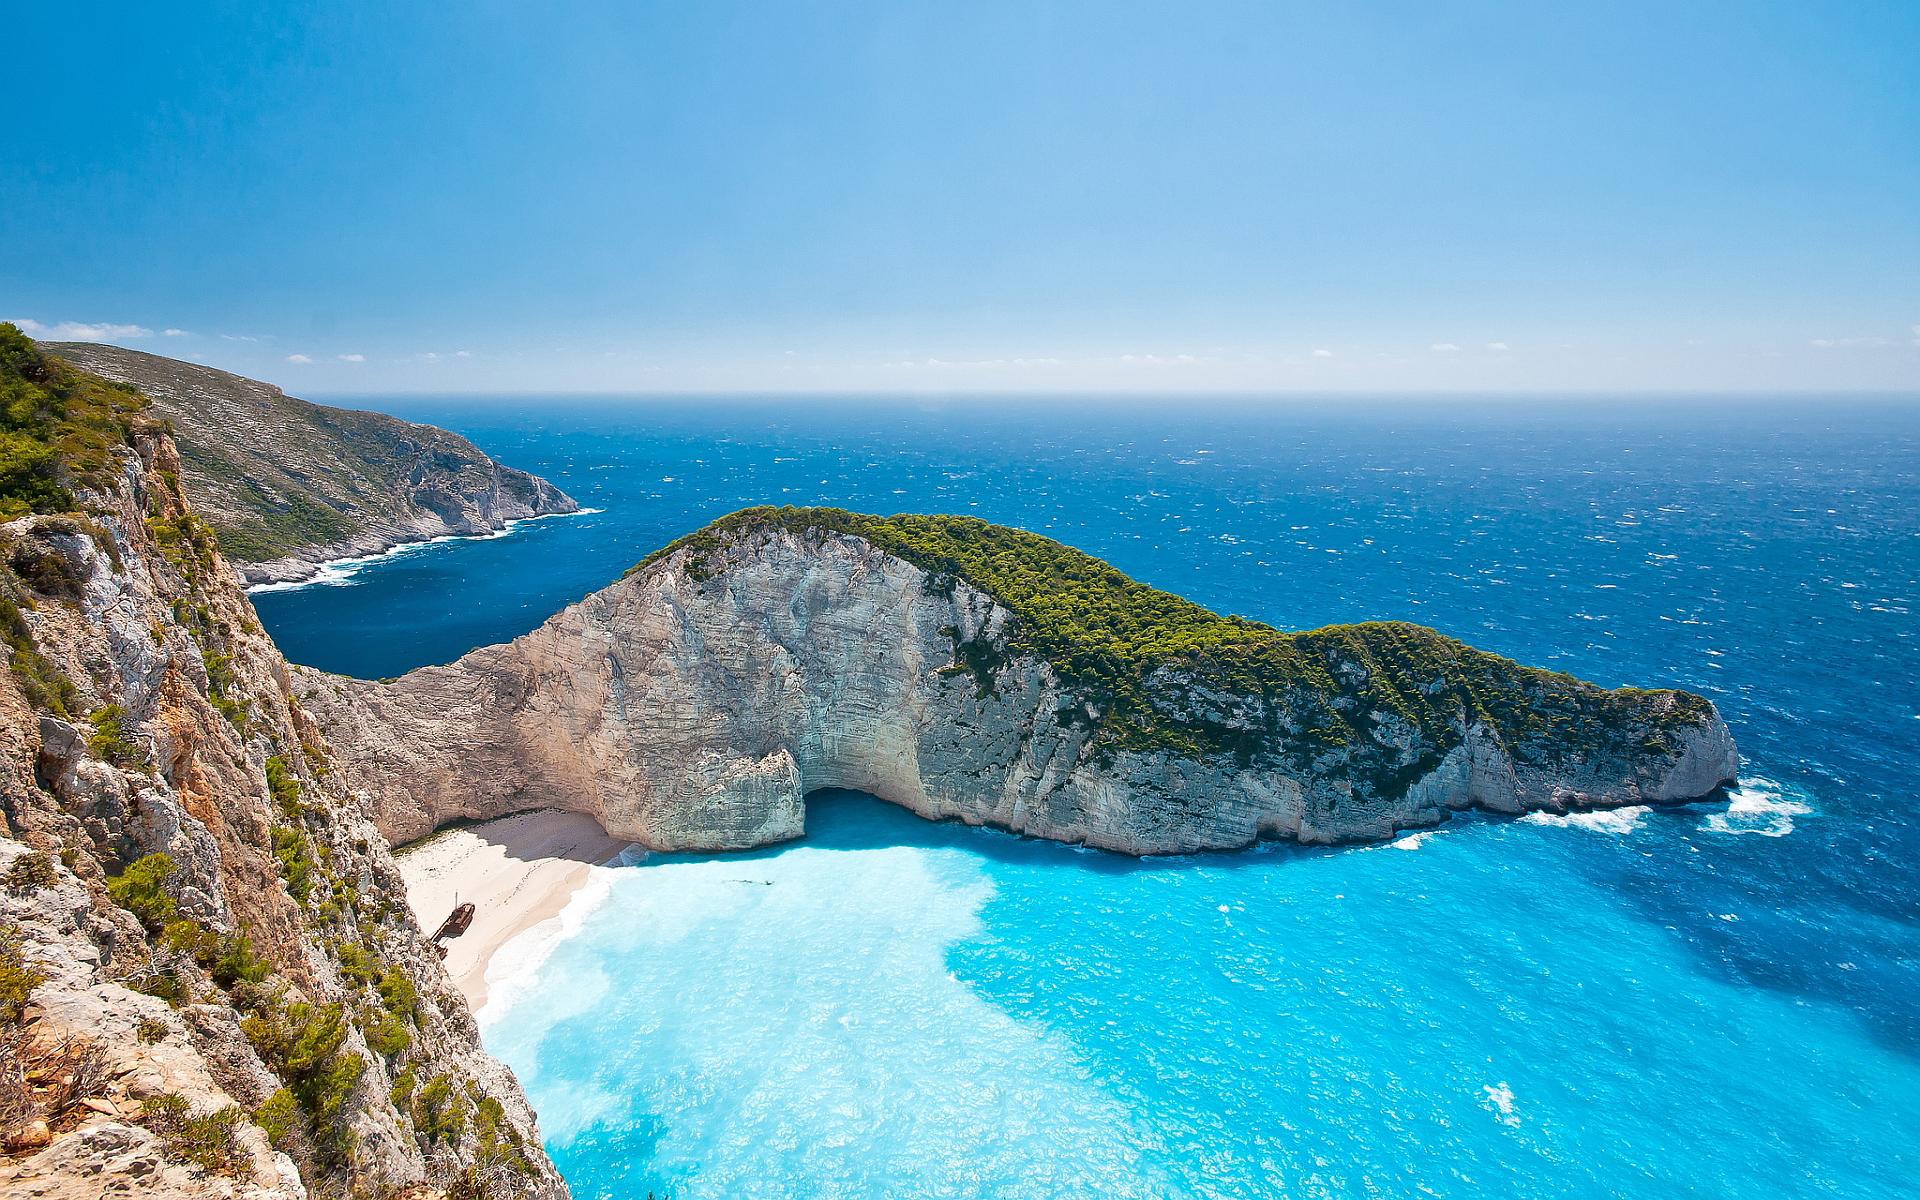 Greece beach zakynthos wallpaper 1920x1200 21499 1920x1200